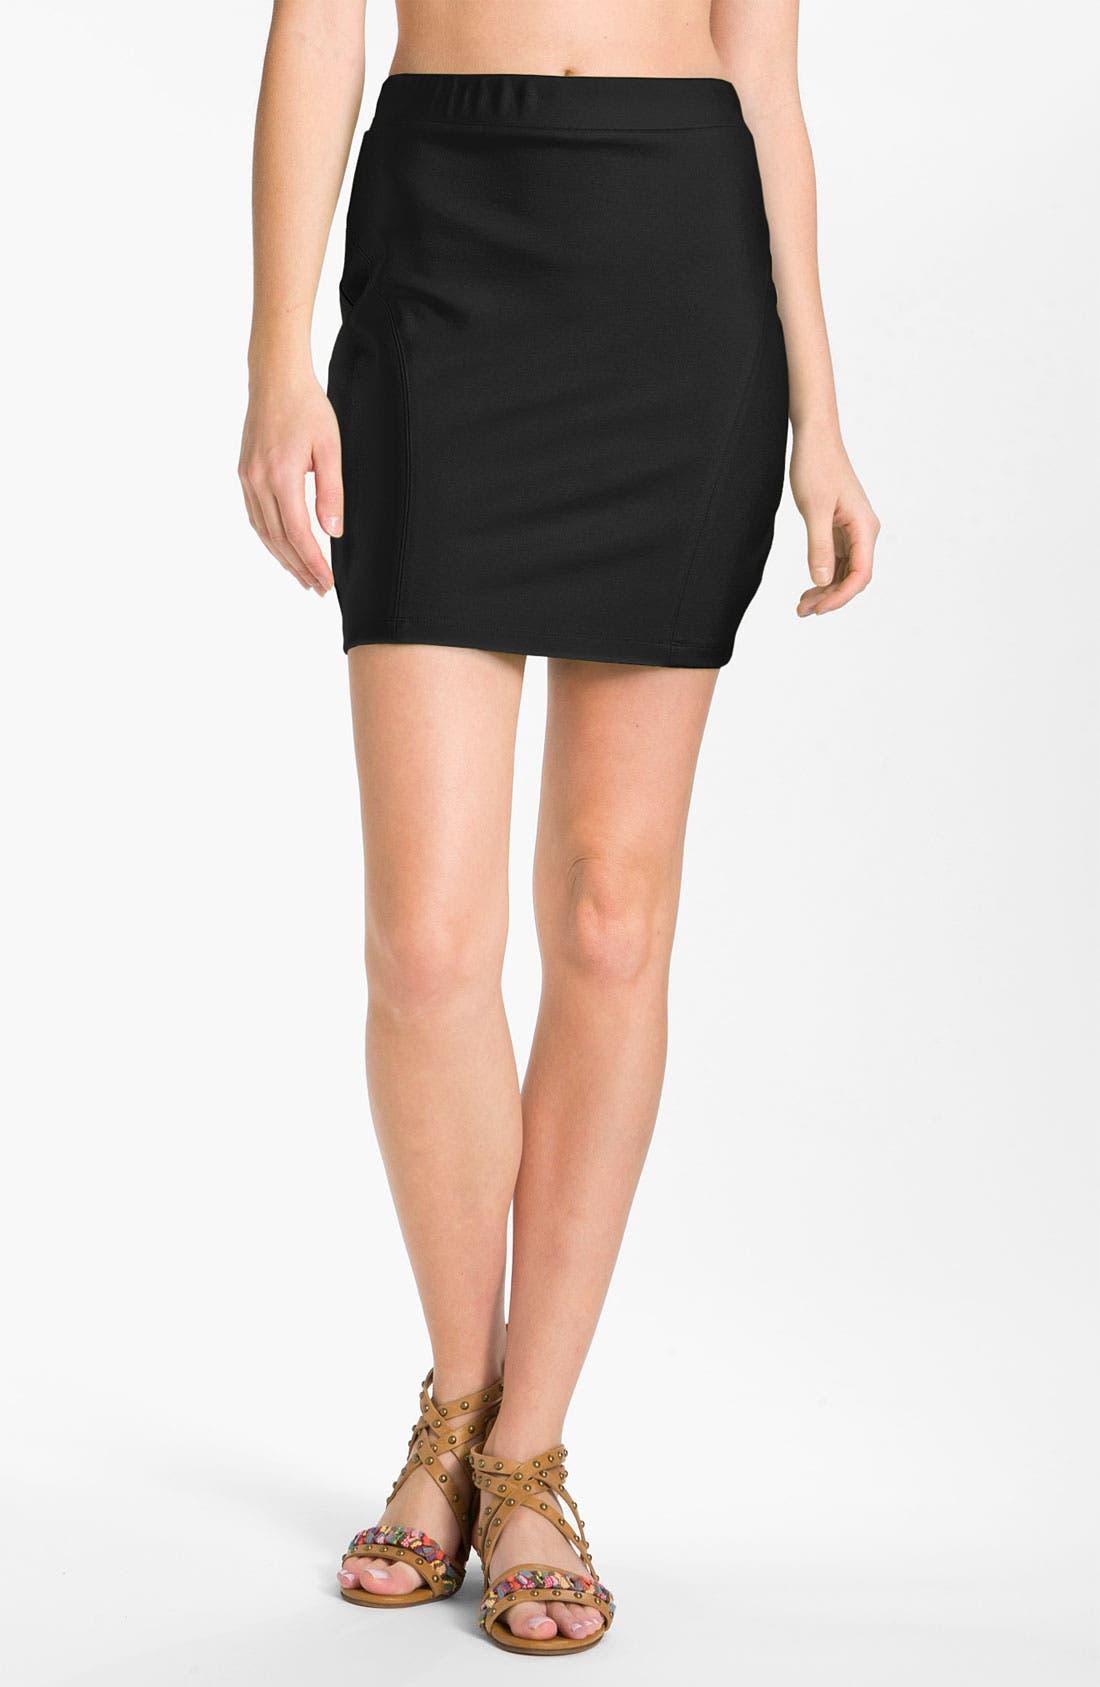 Alternate Image 1 Selected - LMK Seamed Stretch Knit Miniskirt